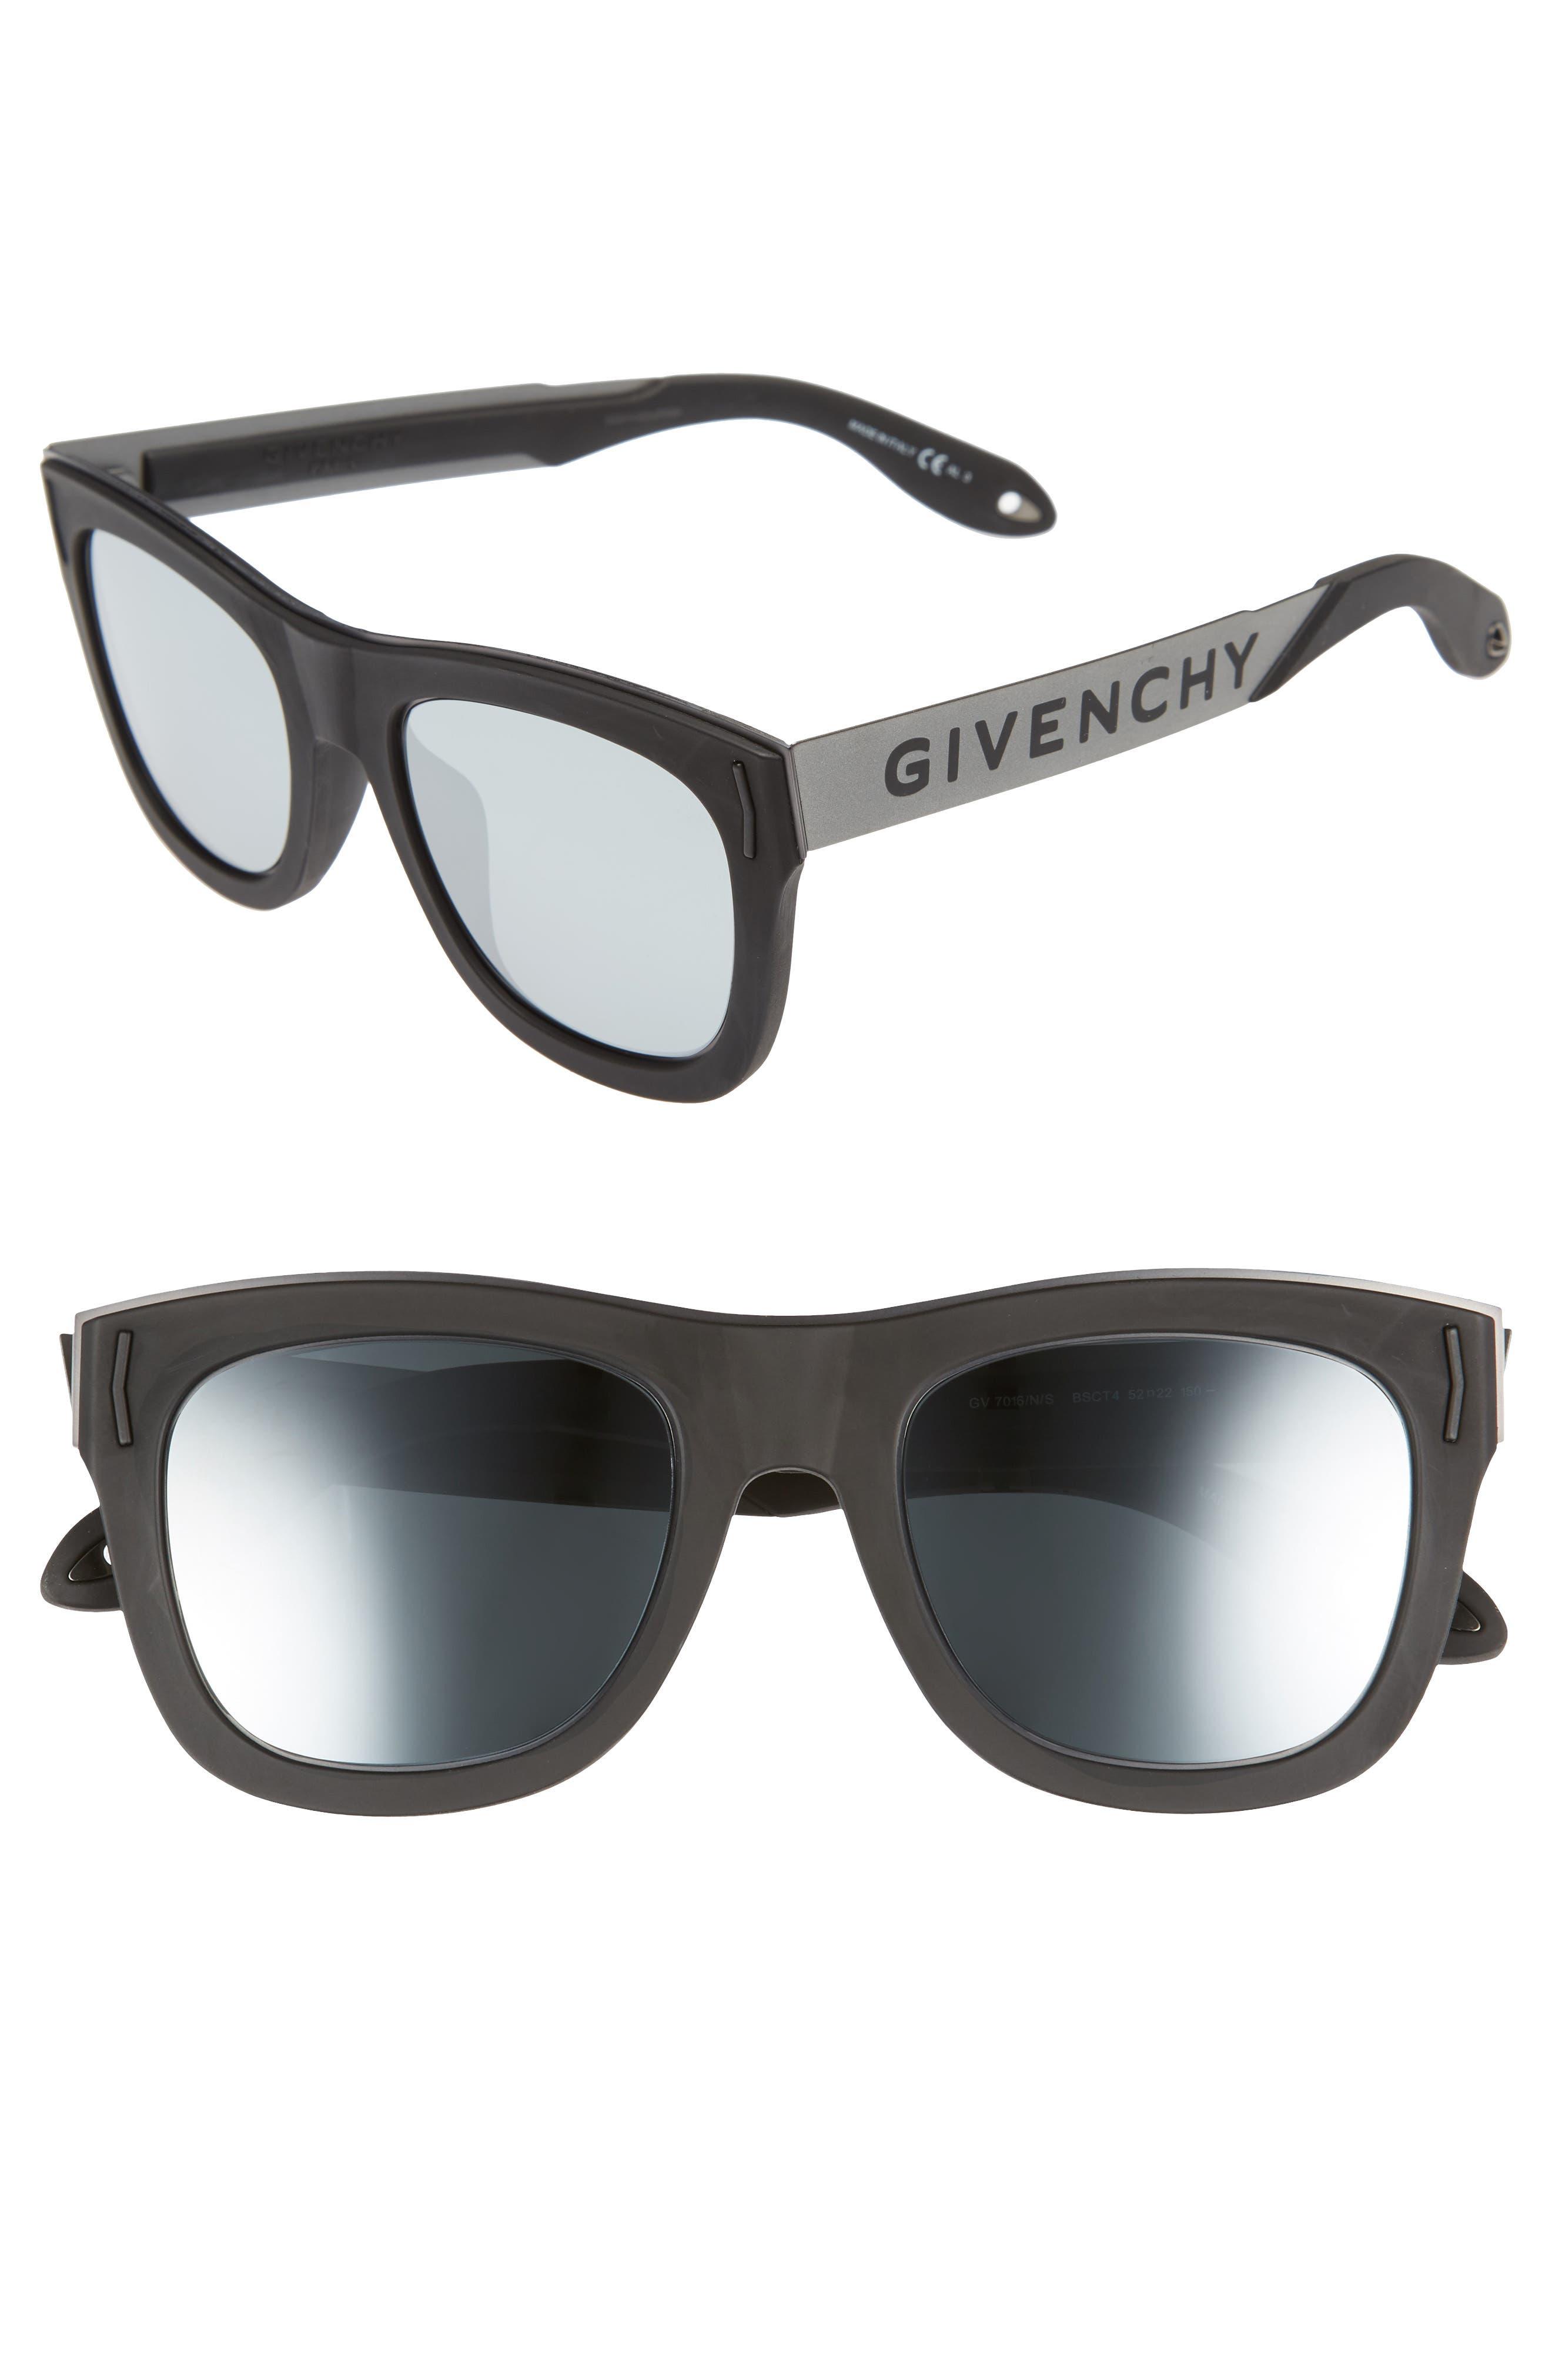 52mm Mirrored Rectangular Sunglasses,                         Main,                         color, 001